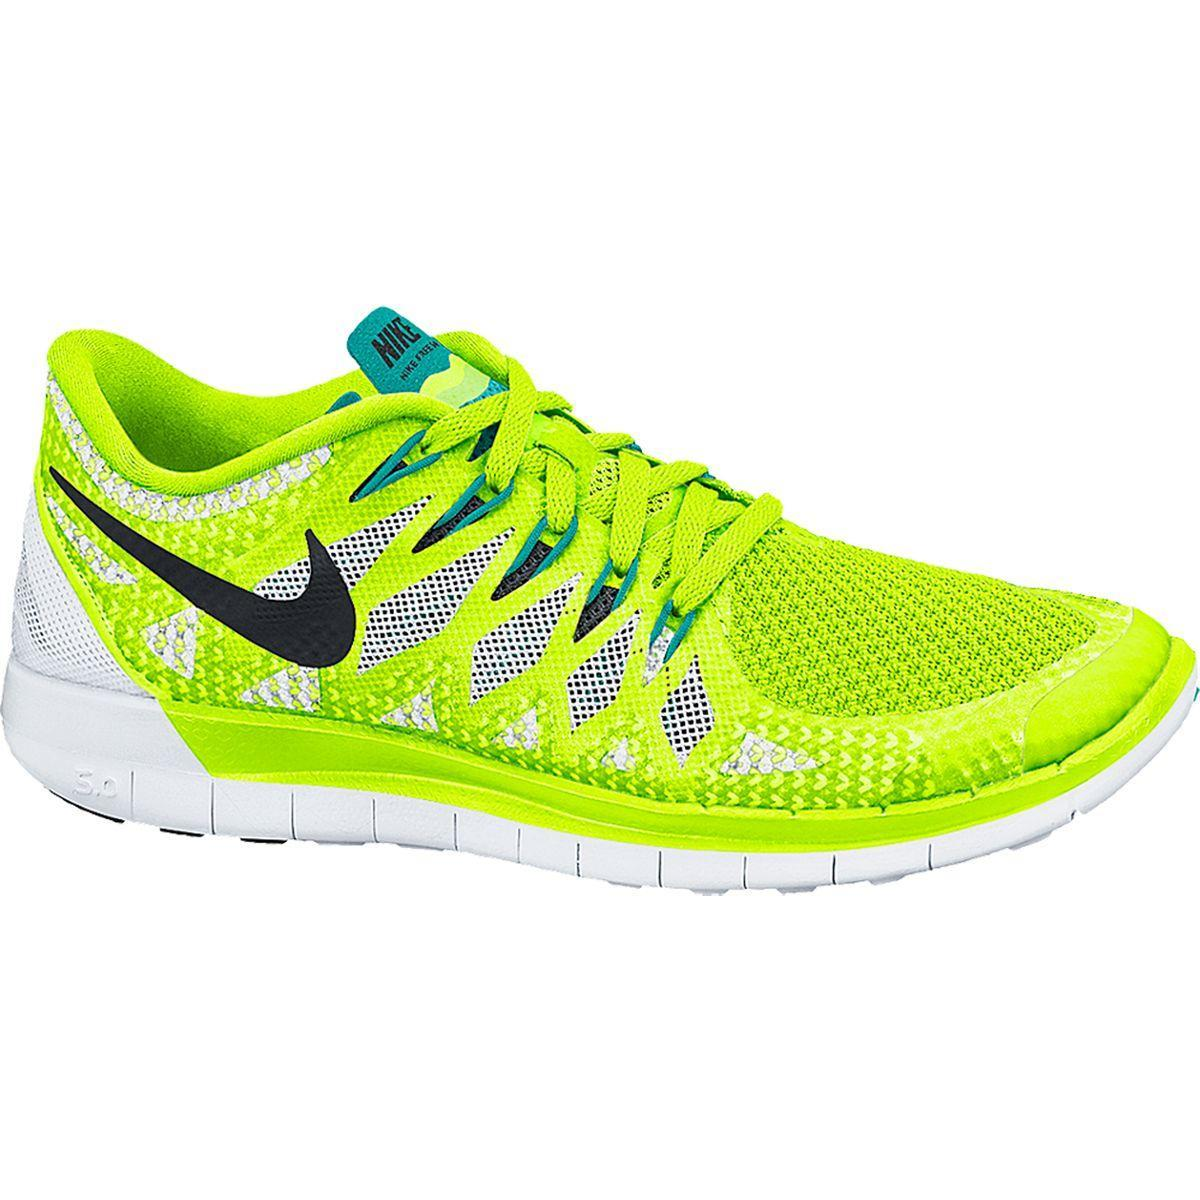 d511fb1578 Nike Womens Free 5.0+ Running Shoes - Volt